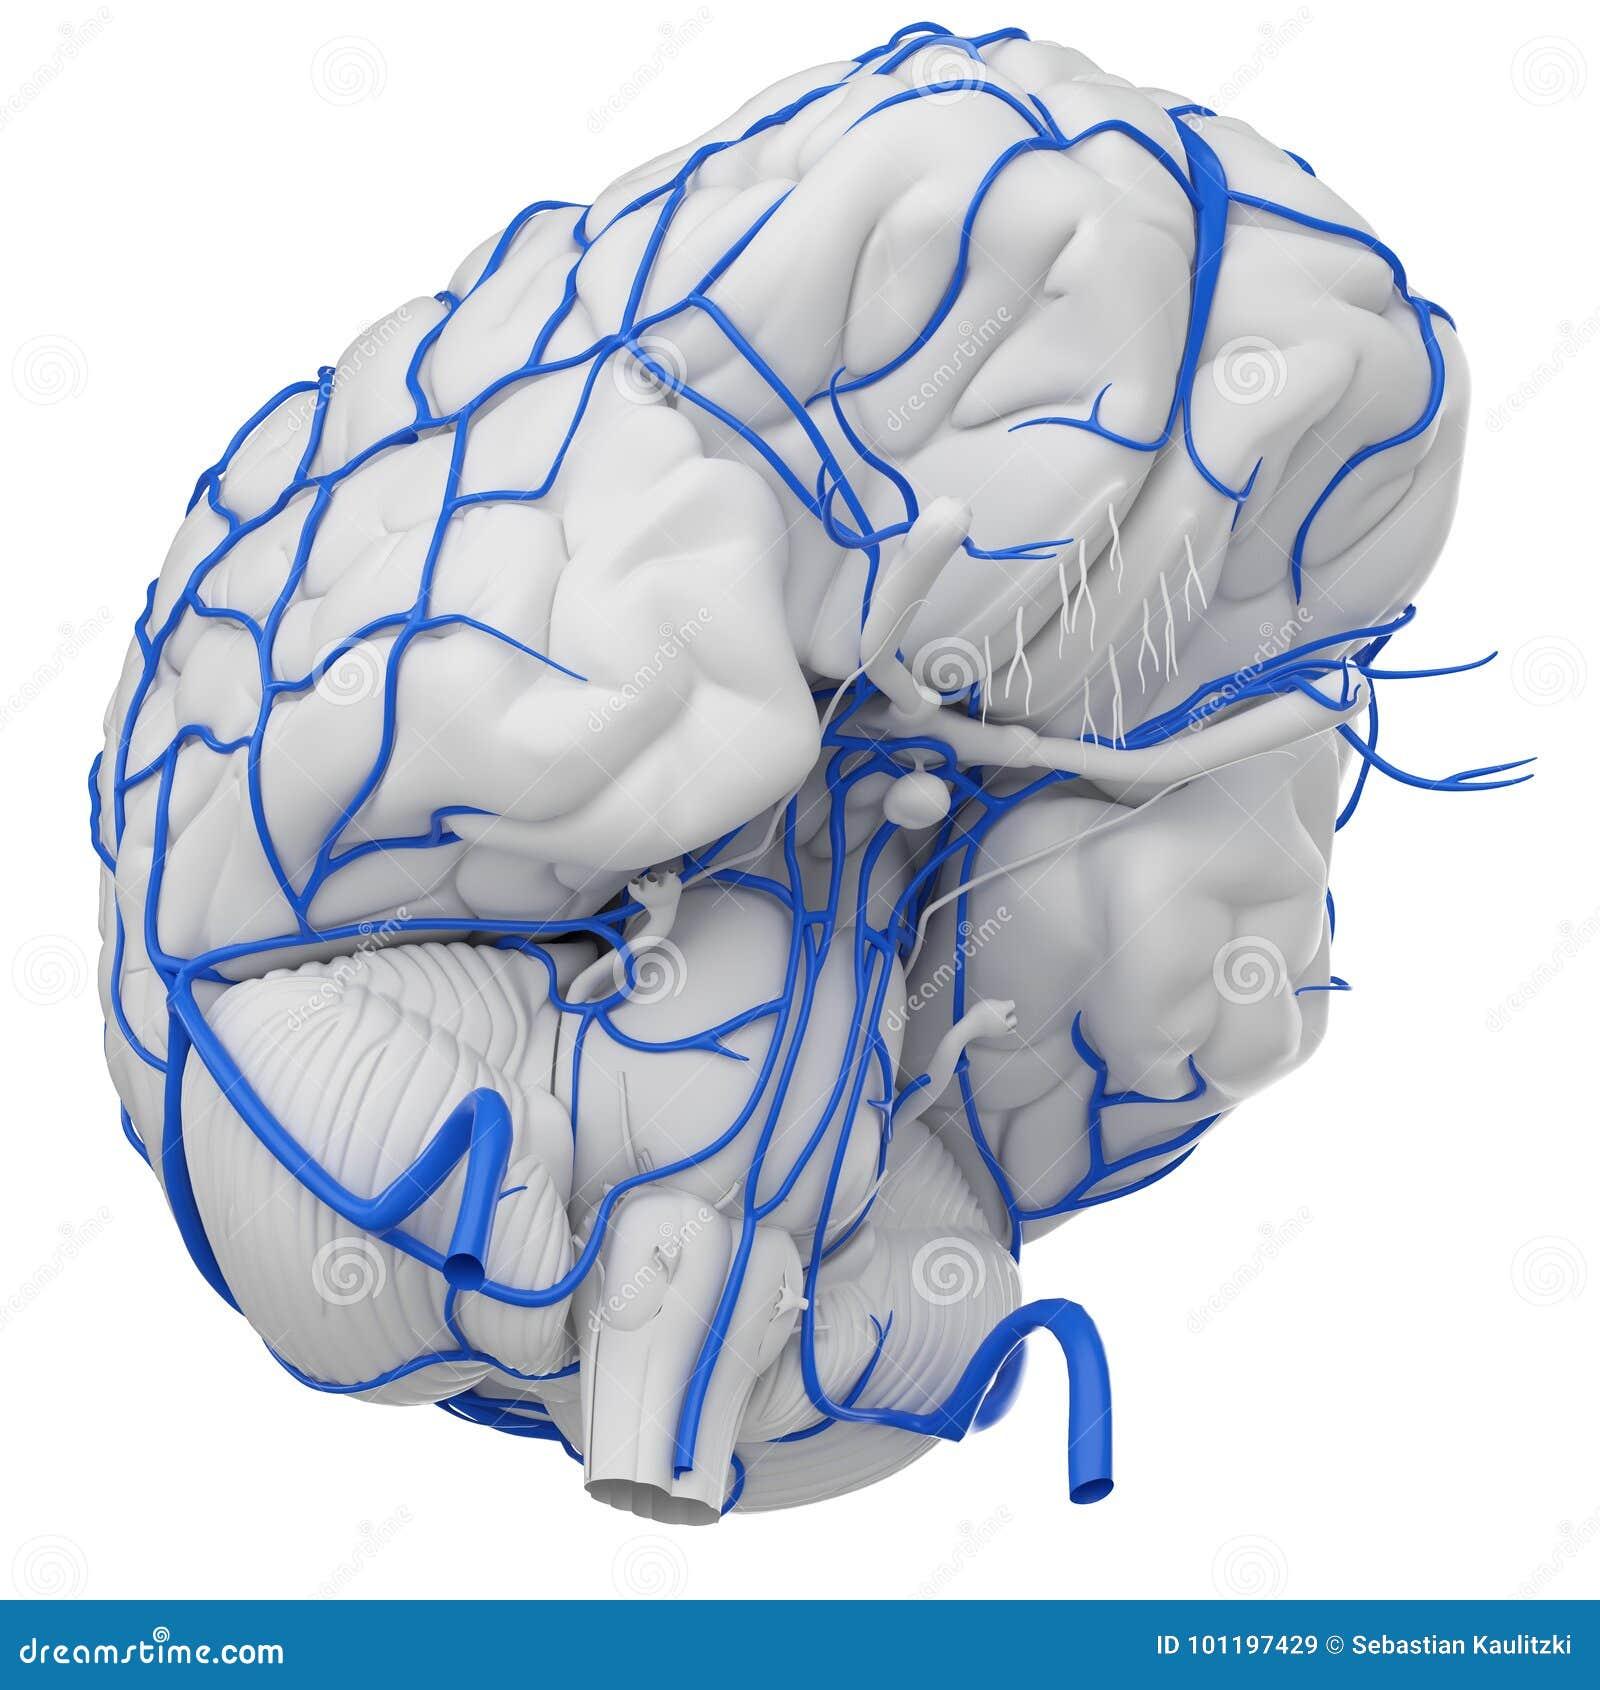 The brain veins stock illustration. Illustration of vascular - 101197429